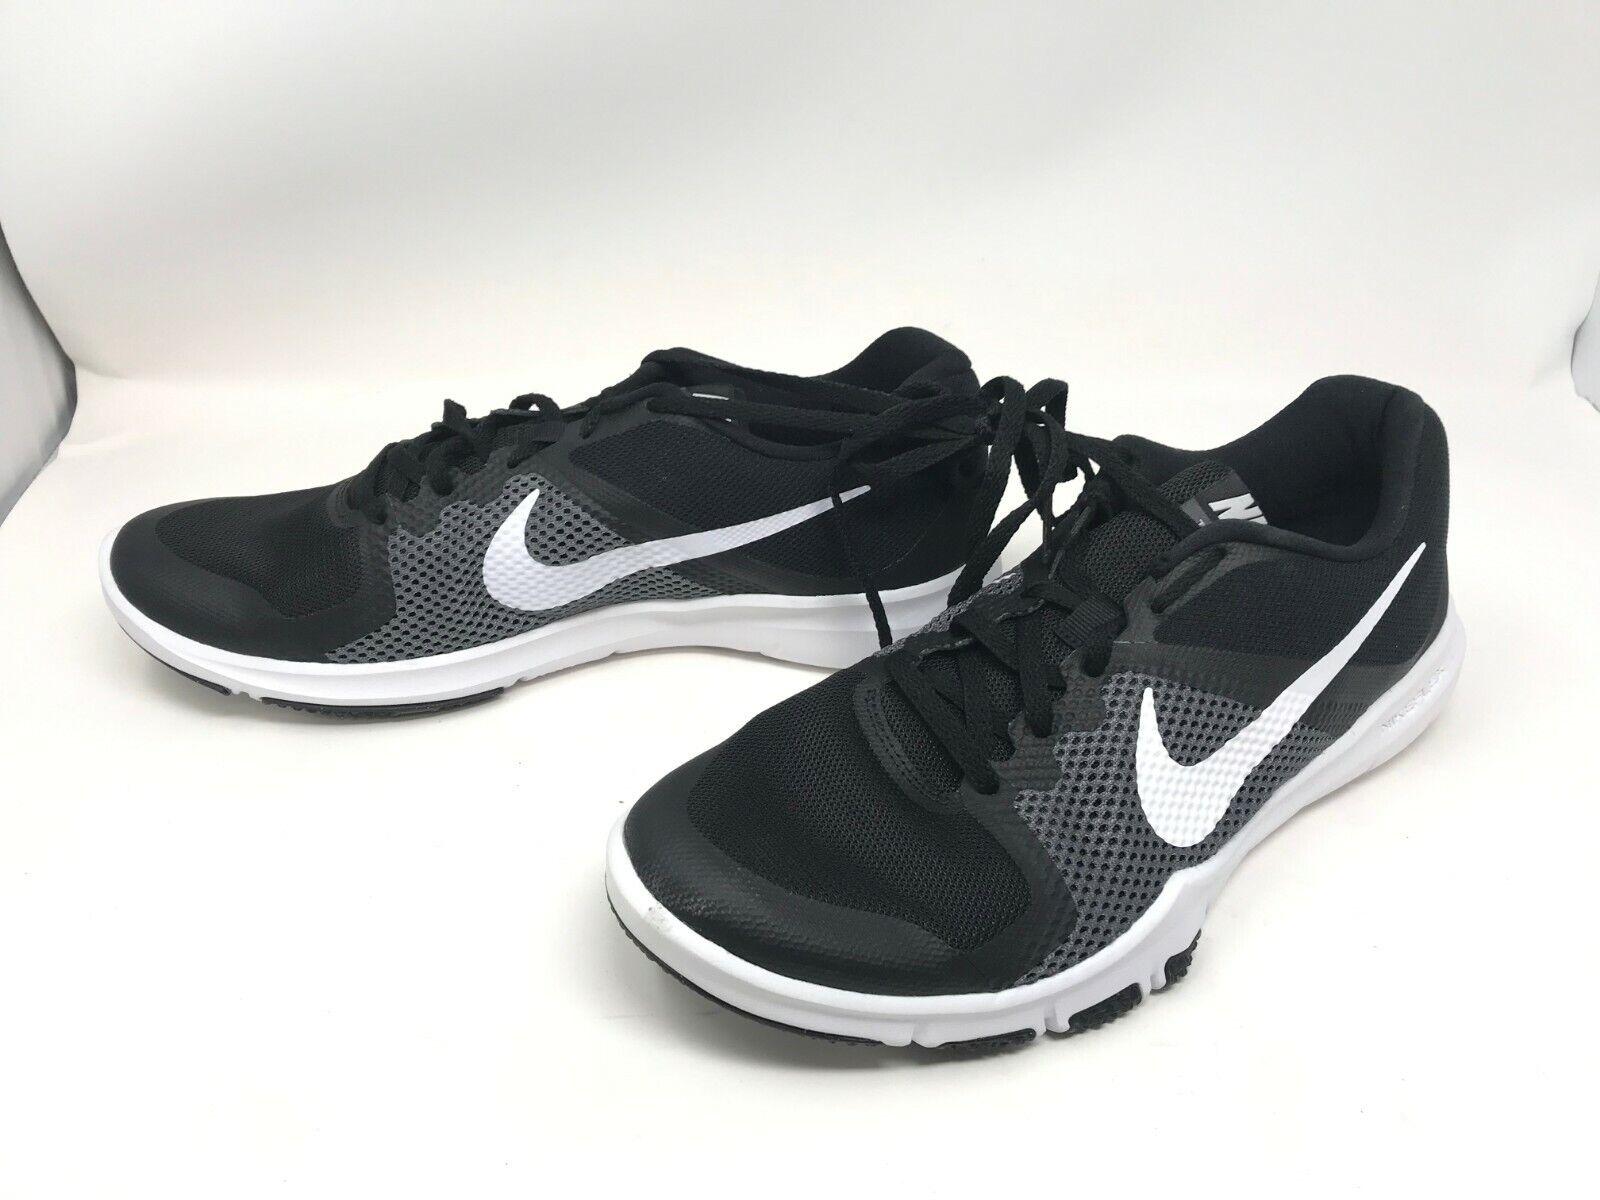 Mens Nike Nike Nike (898459-010) Flex Control Cross Trainer shoes (28N) 753c73